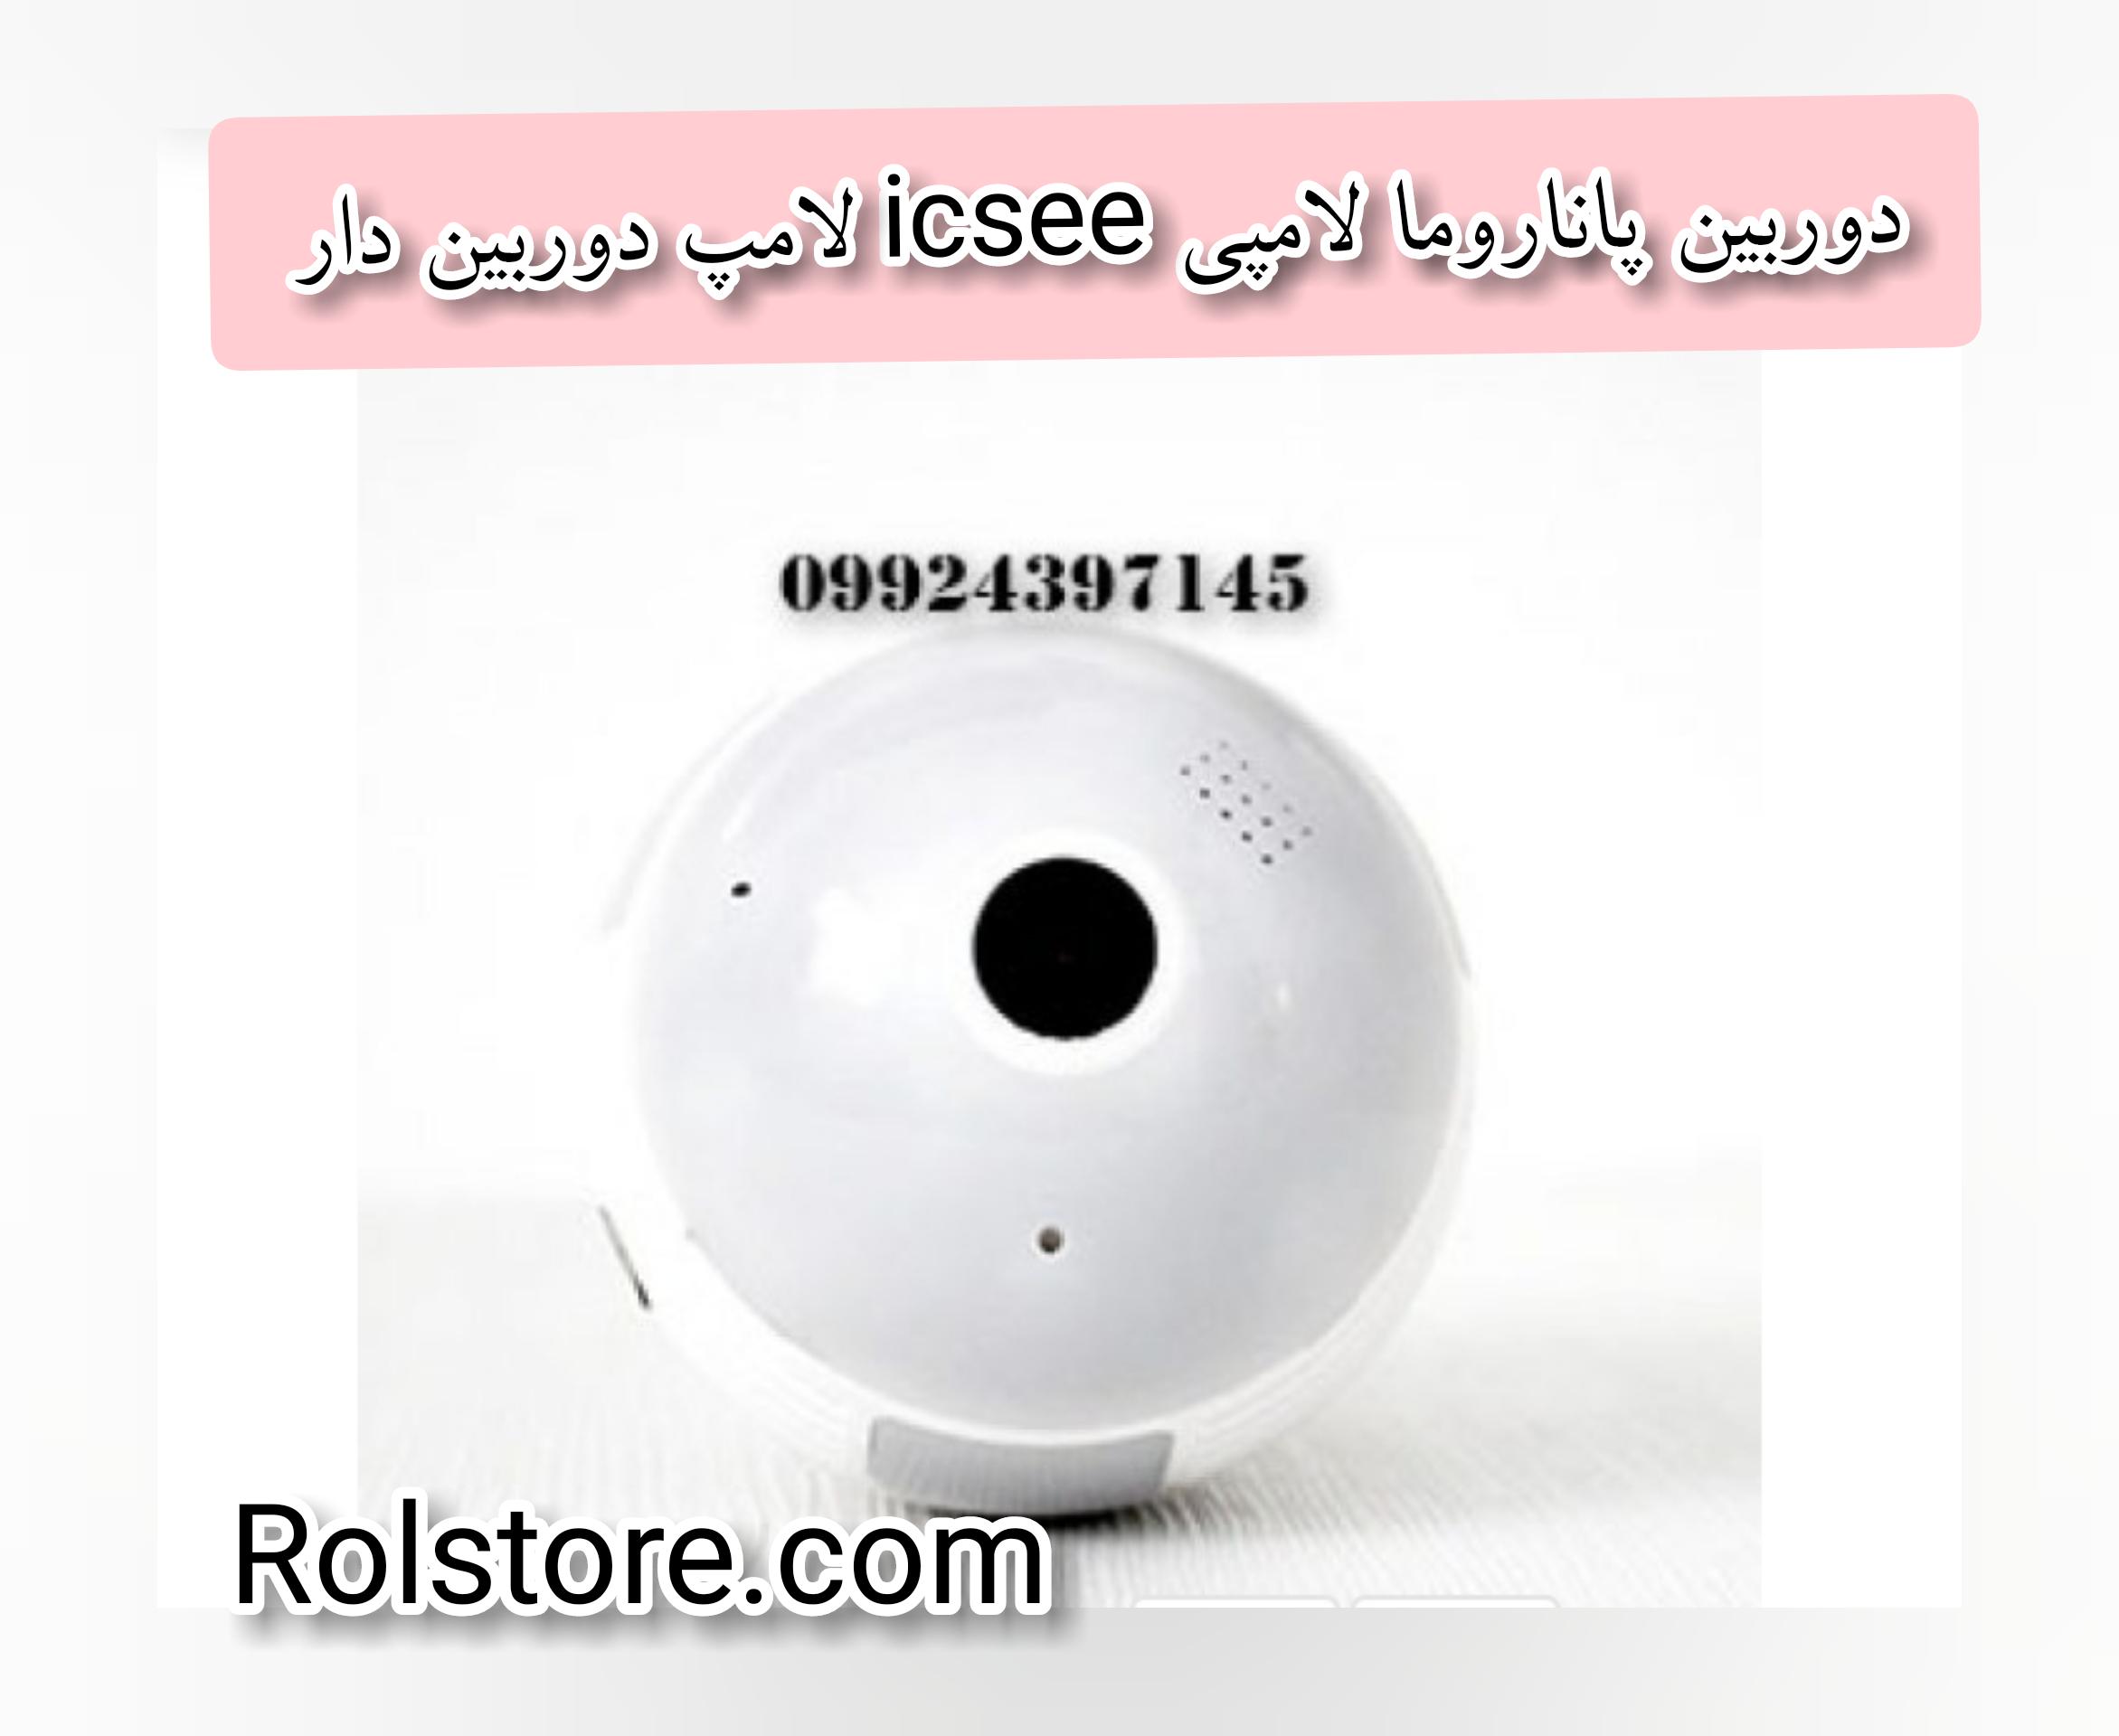 دوربین طرح لامپ/۰۹۹۲۴۳۹۷۱۴۵/دوربین پاناروما لامپی icsee لامپ دوربین دار